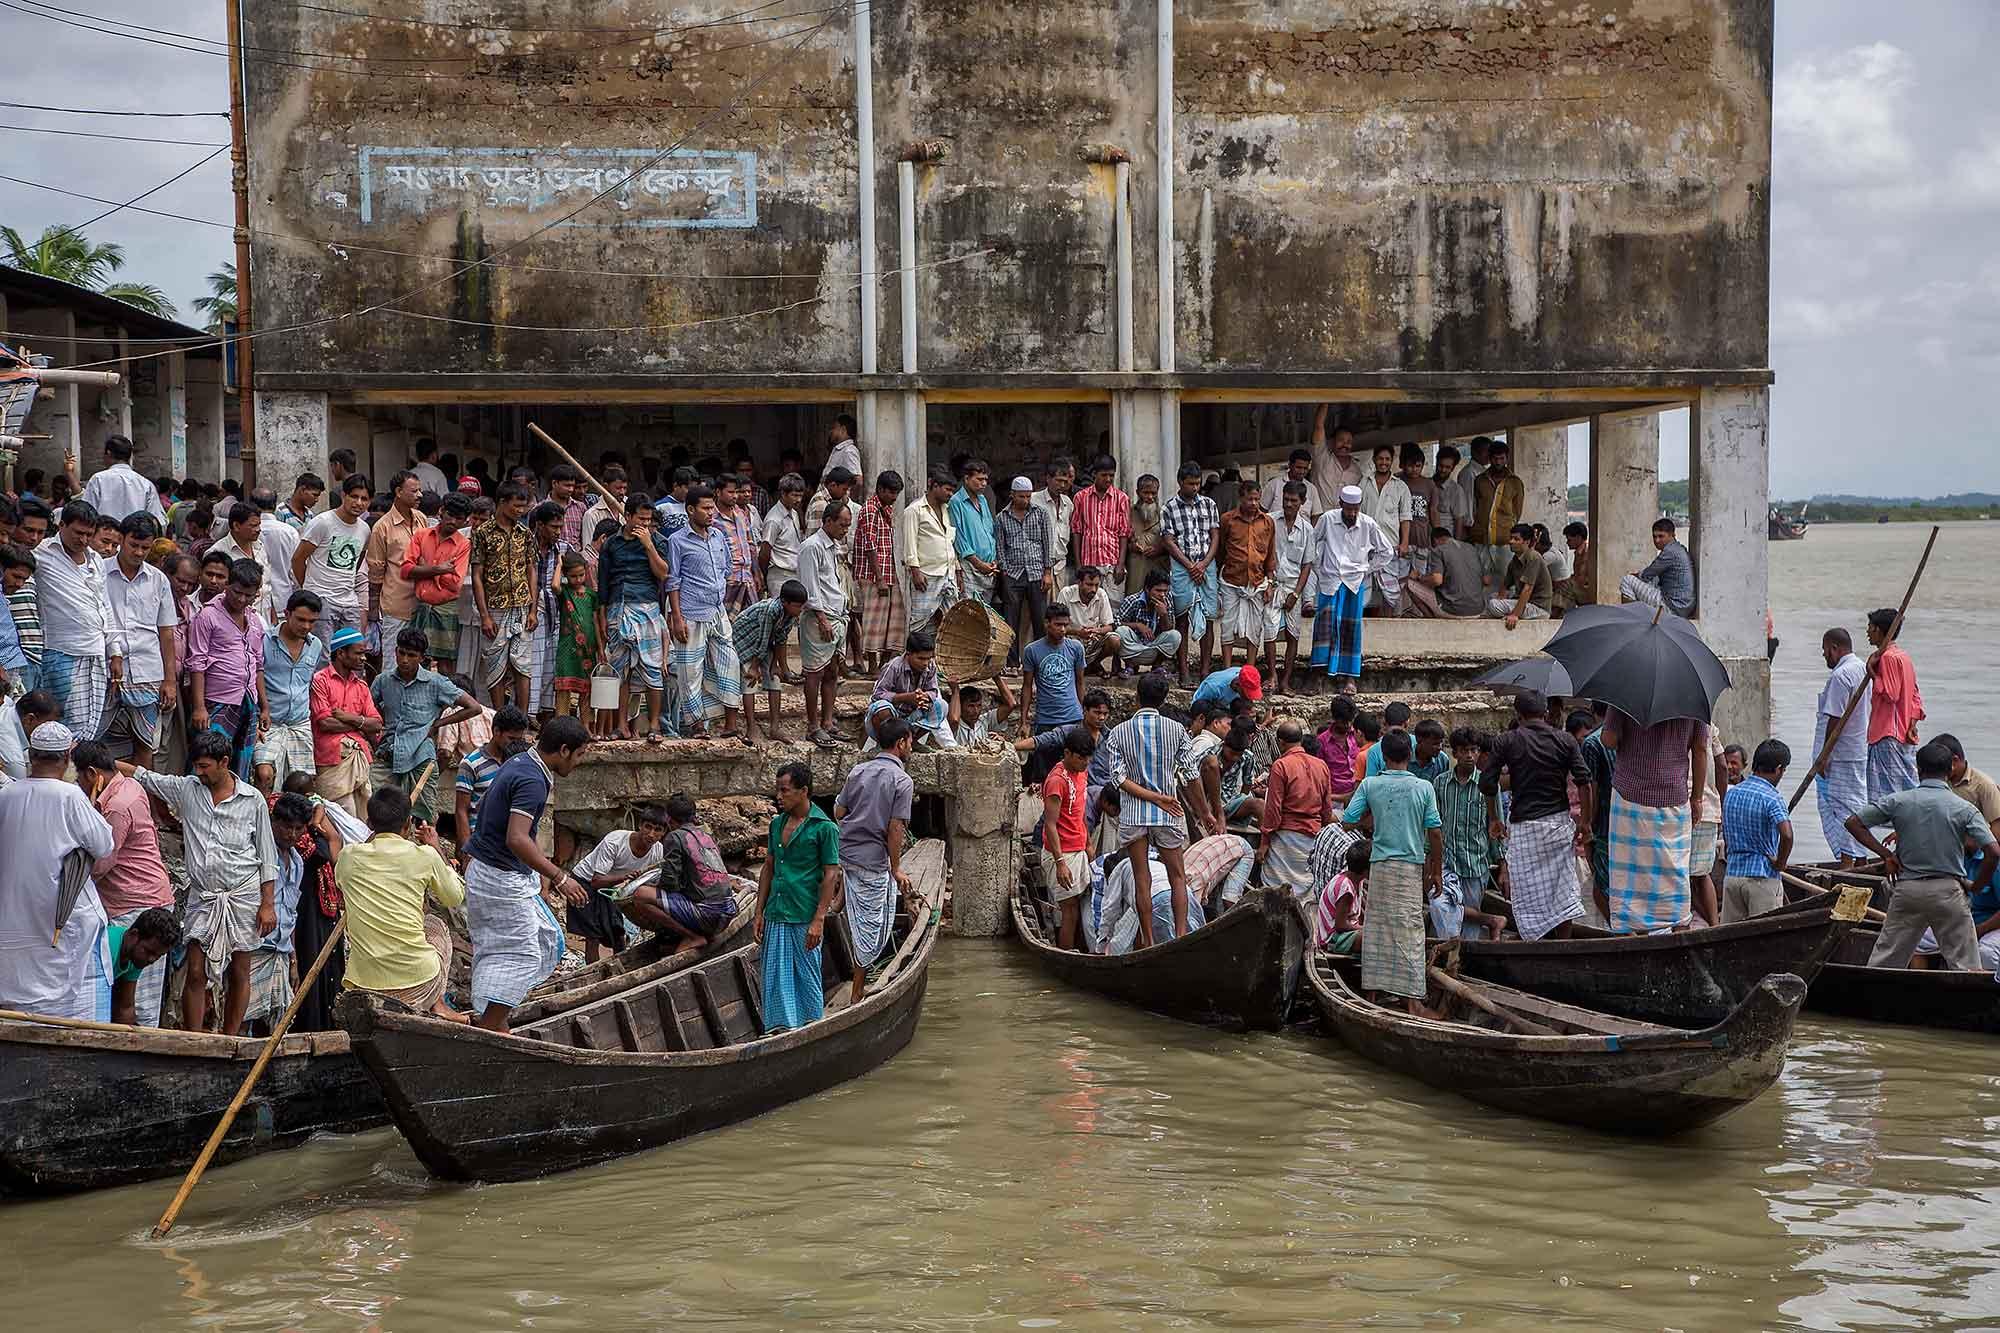 At the fish market in Cox's Bazar, Bangaldesh. © Ulli Maier & Nisa Maier